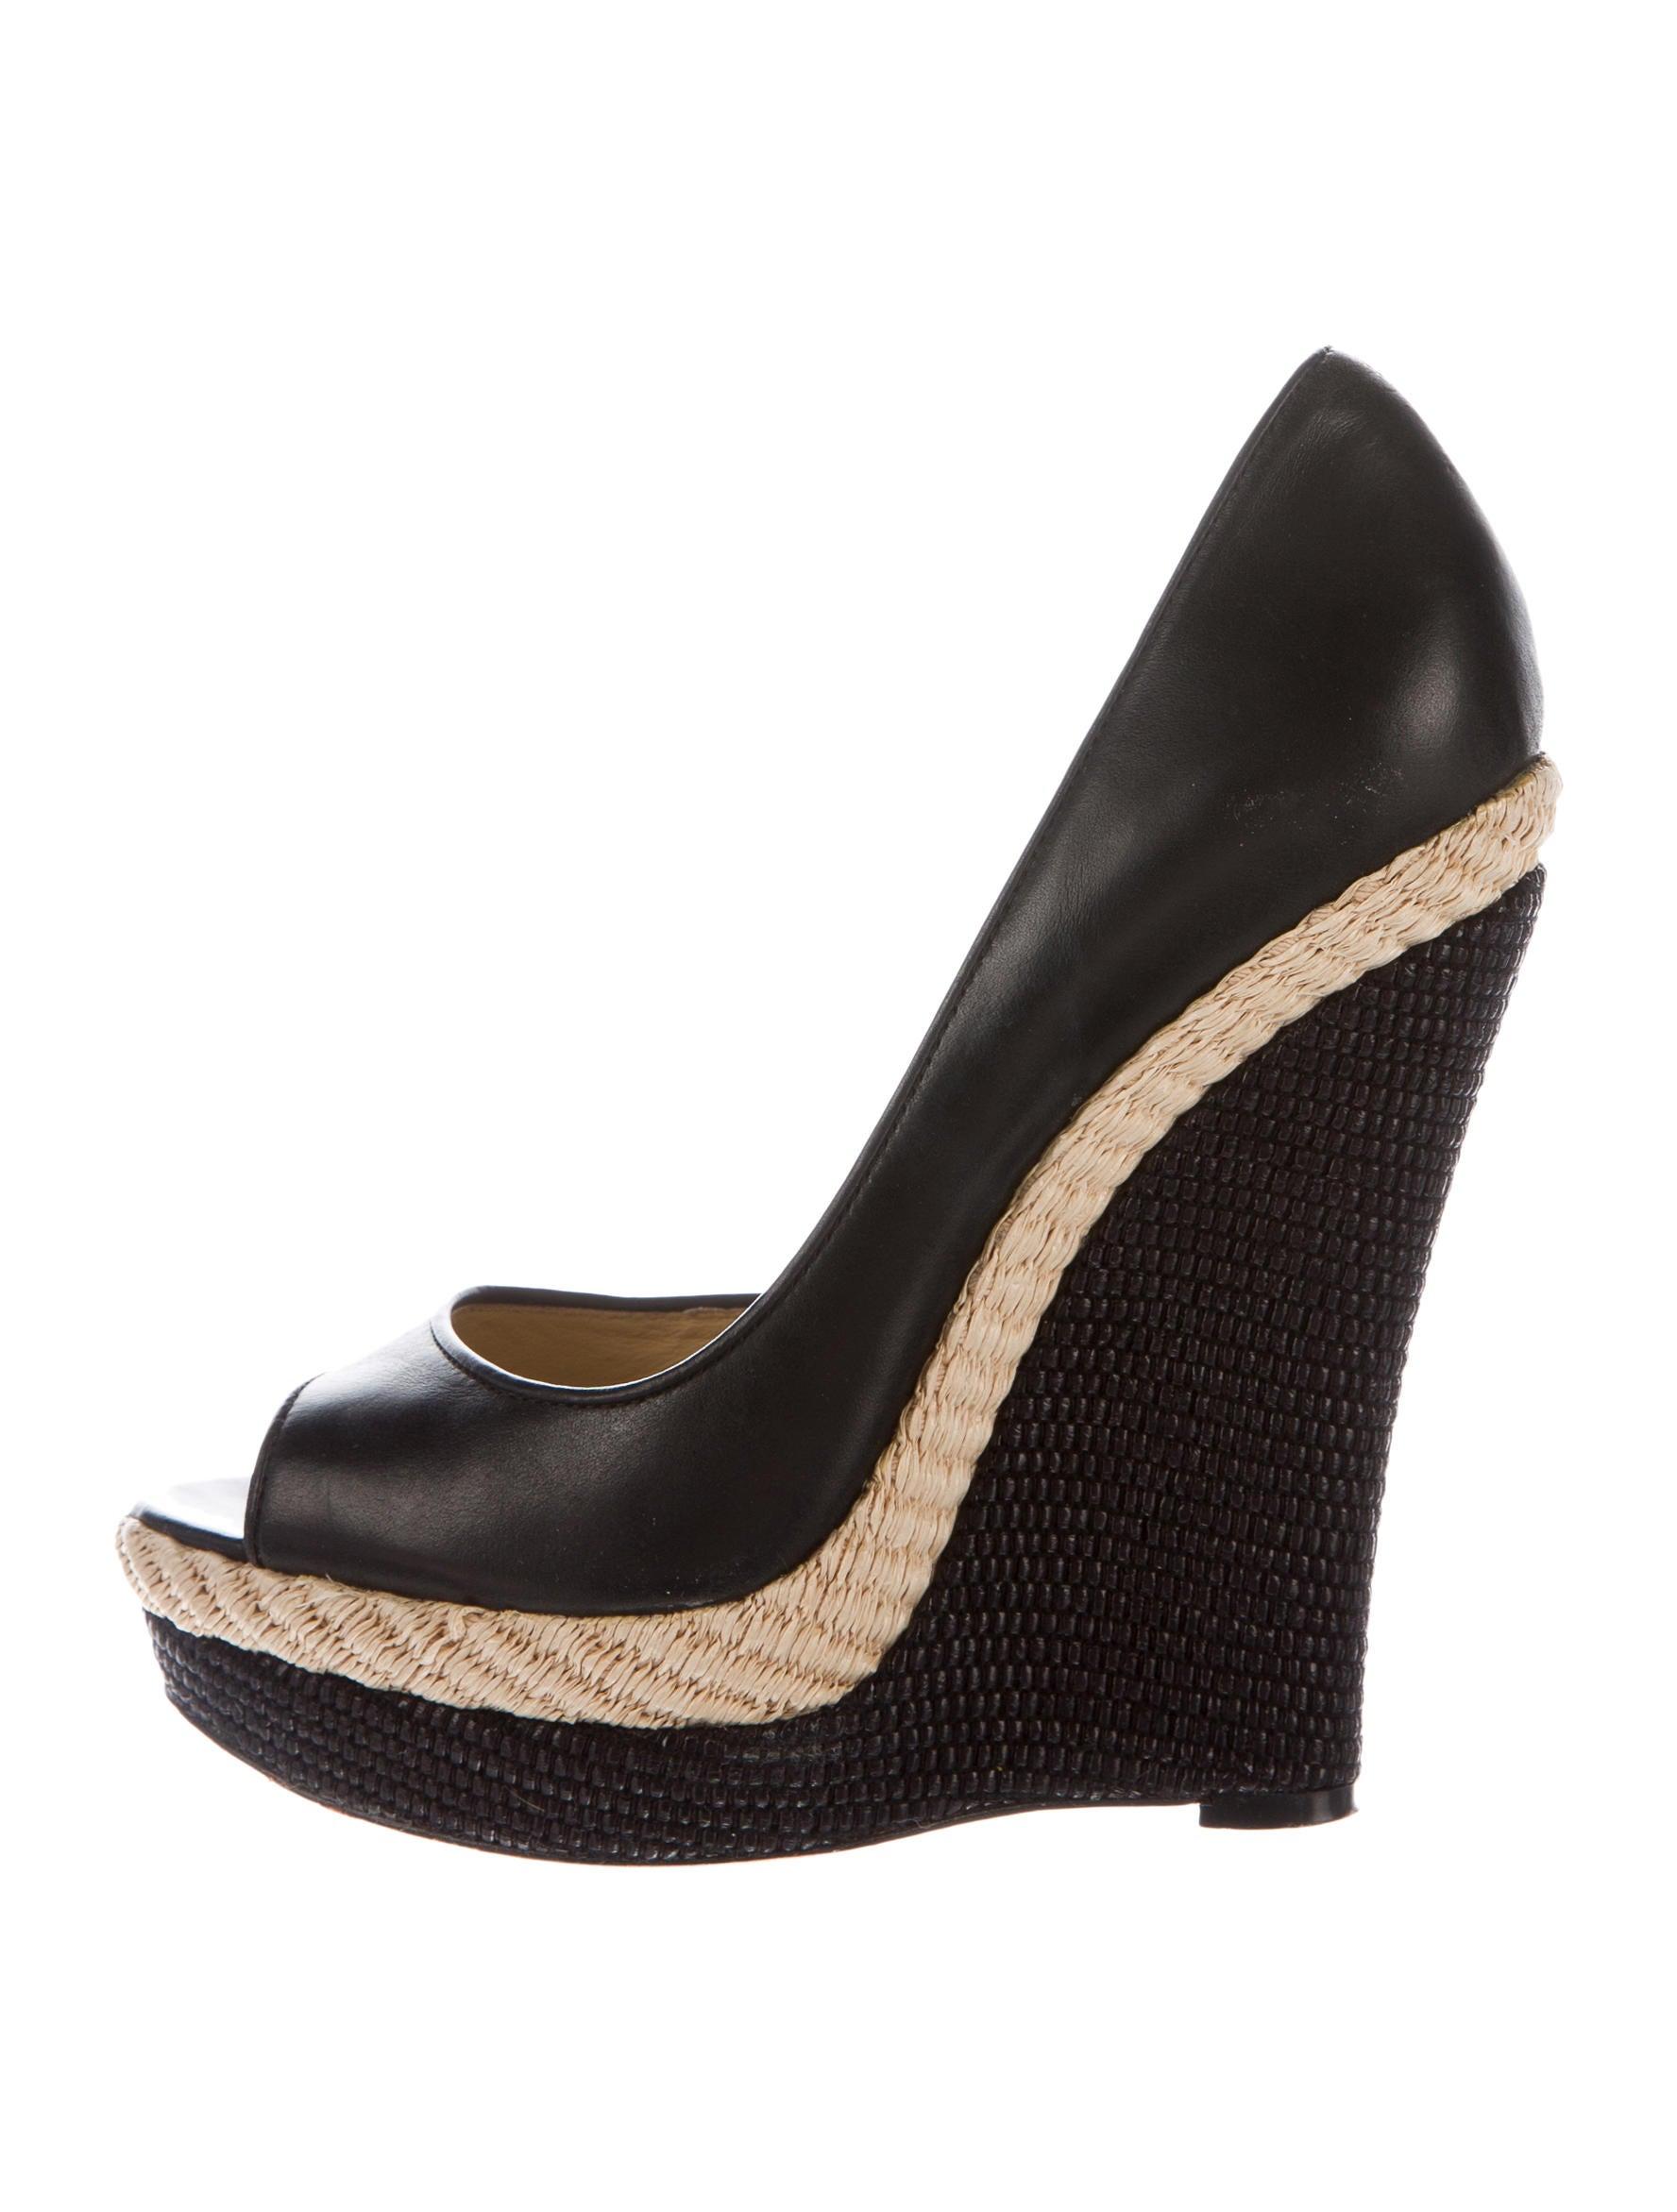 zoe peep toe espadrille wedges shoes wrl24498